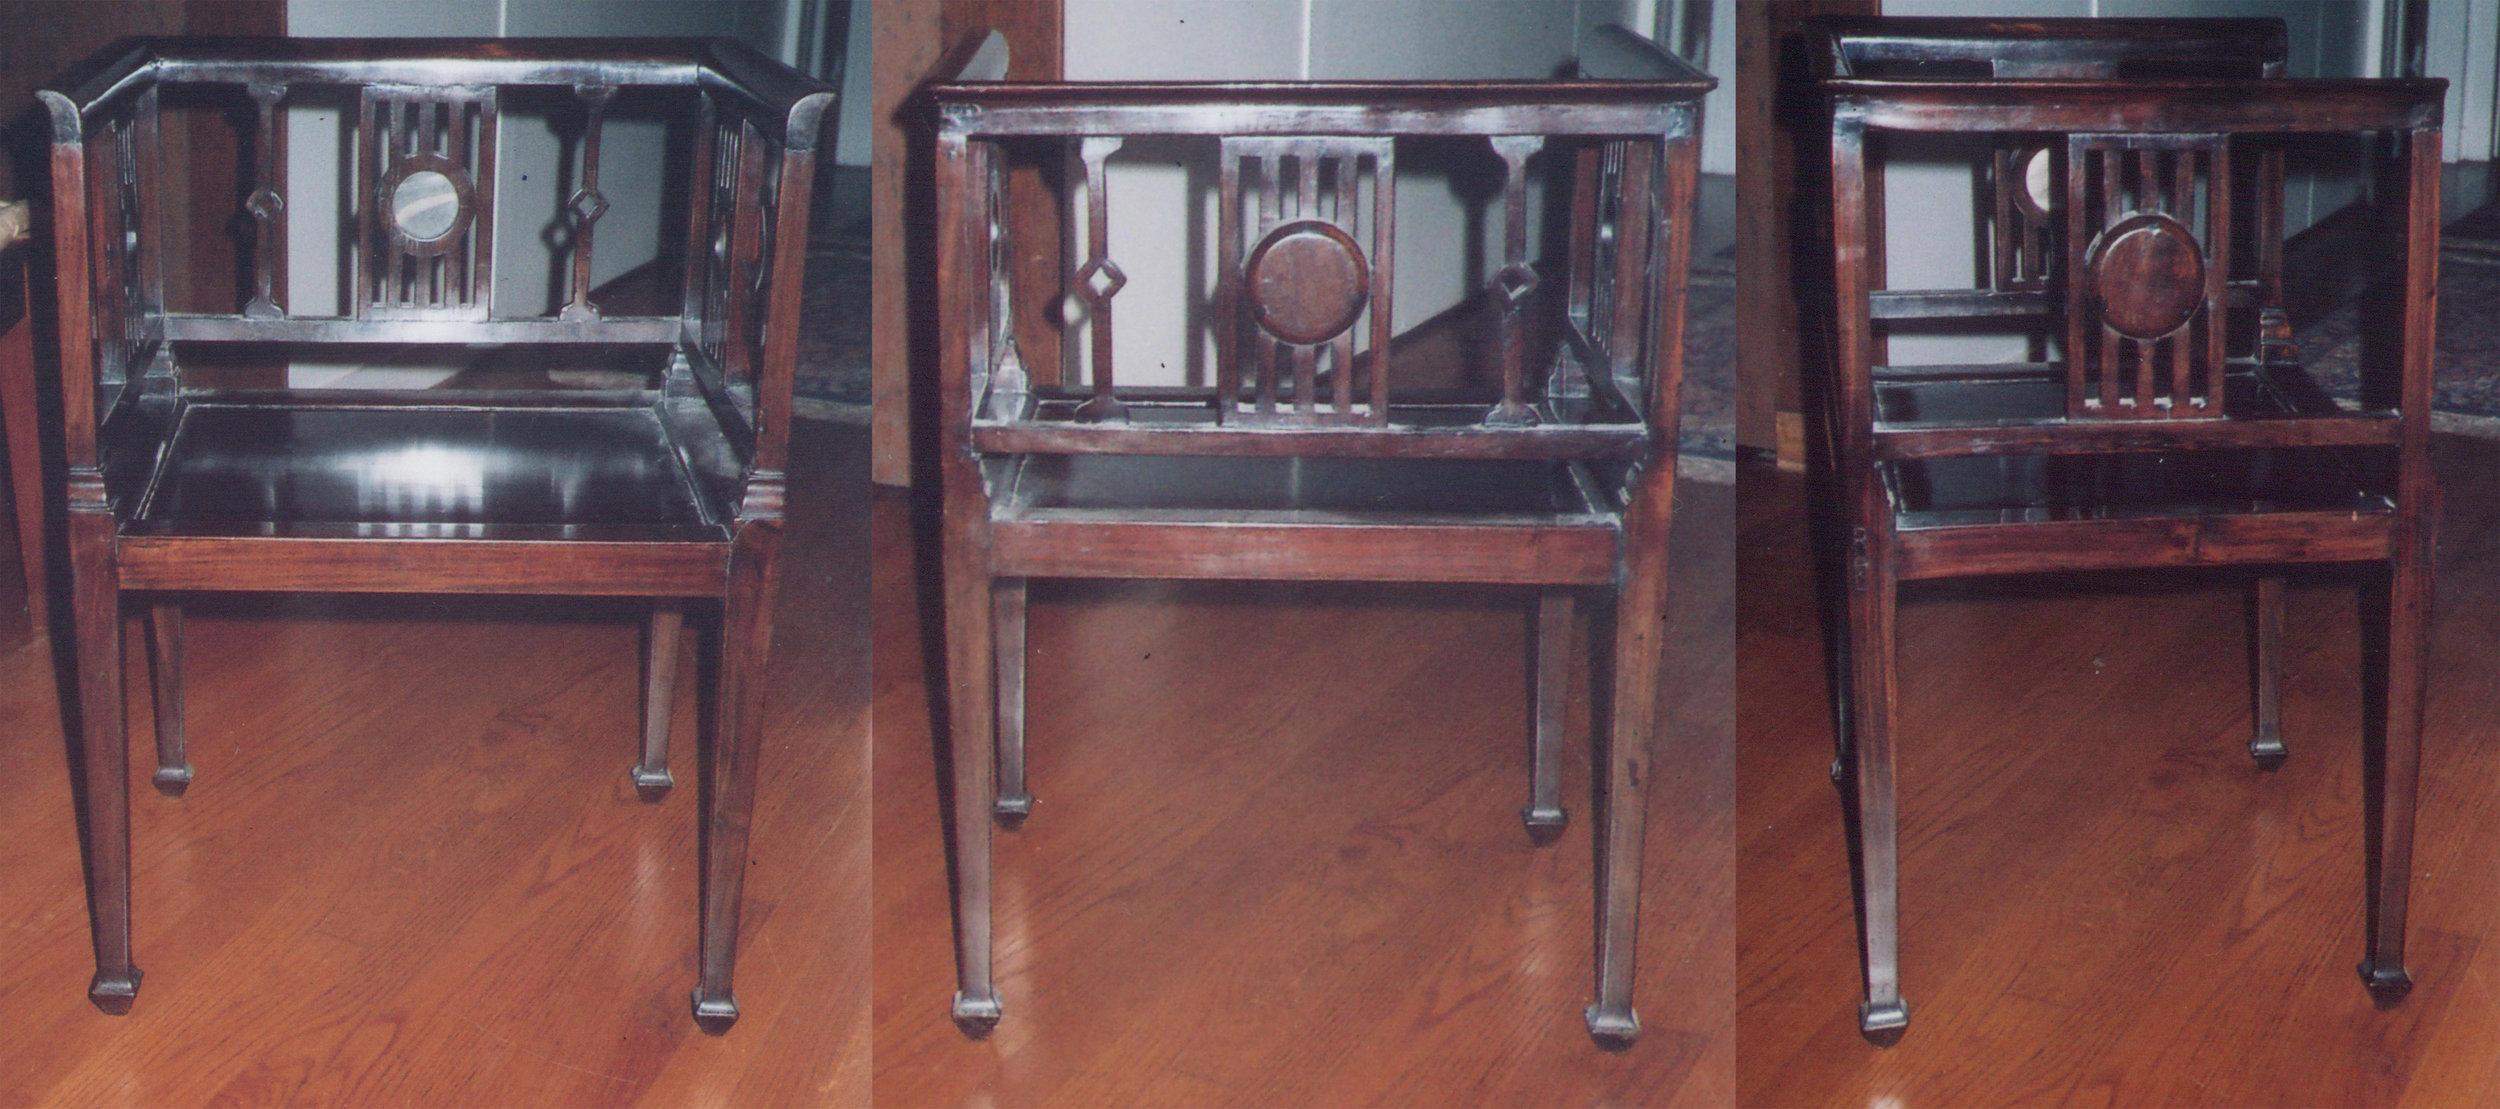 ....bespoke furniture : reference photos..特别定制家具 : 参考照片....